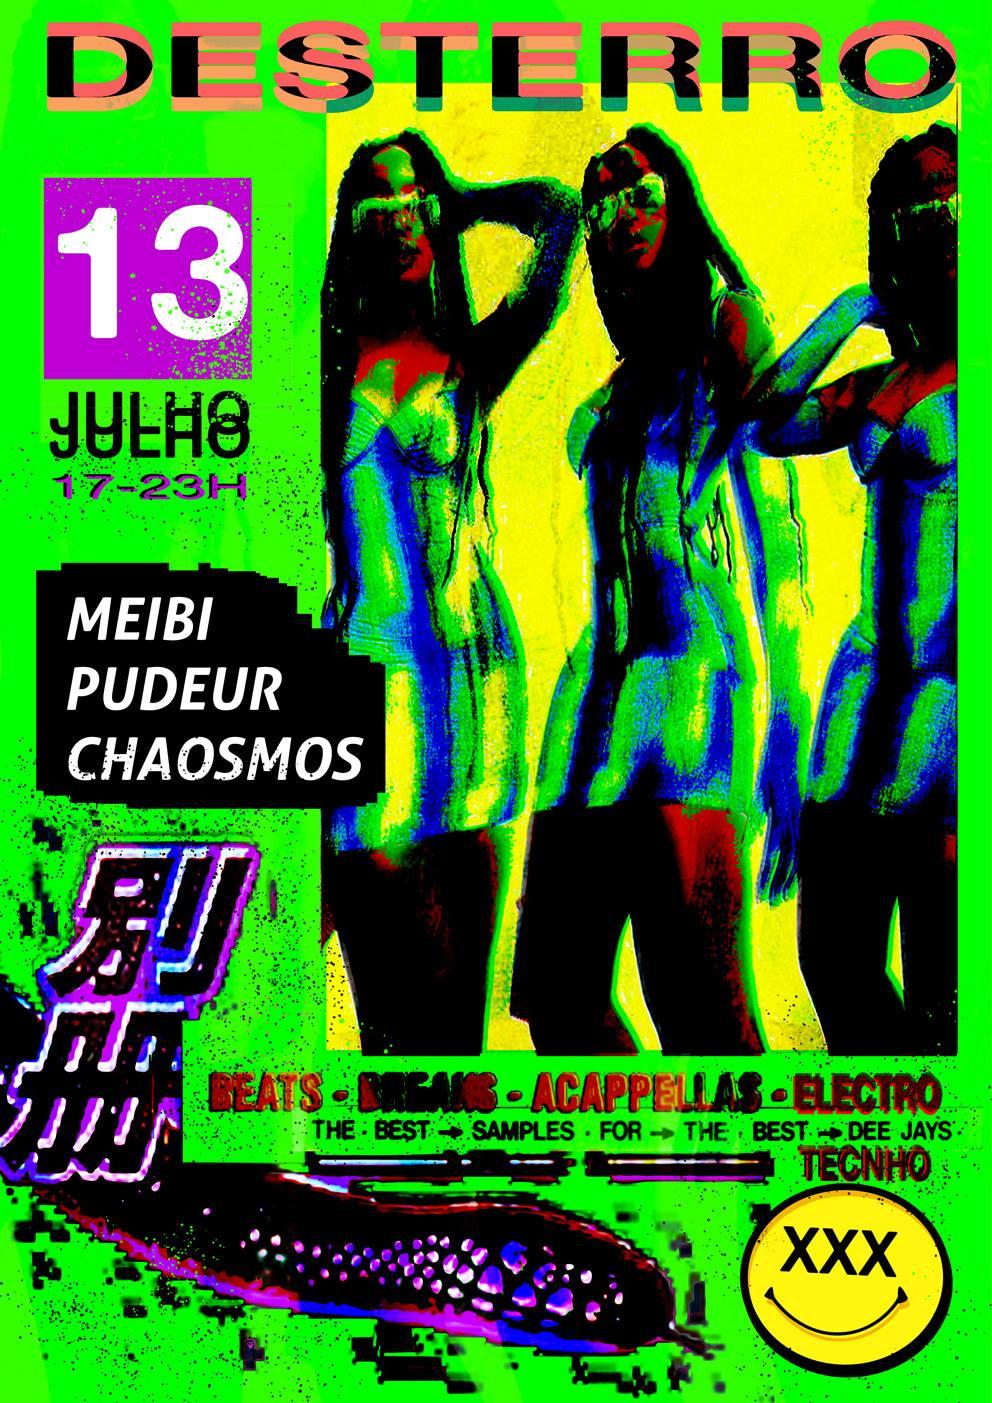 Chaosmos + Pudeur + Meibi